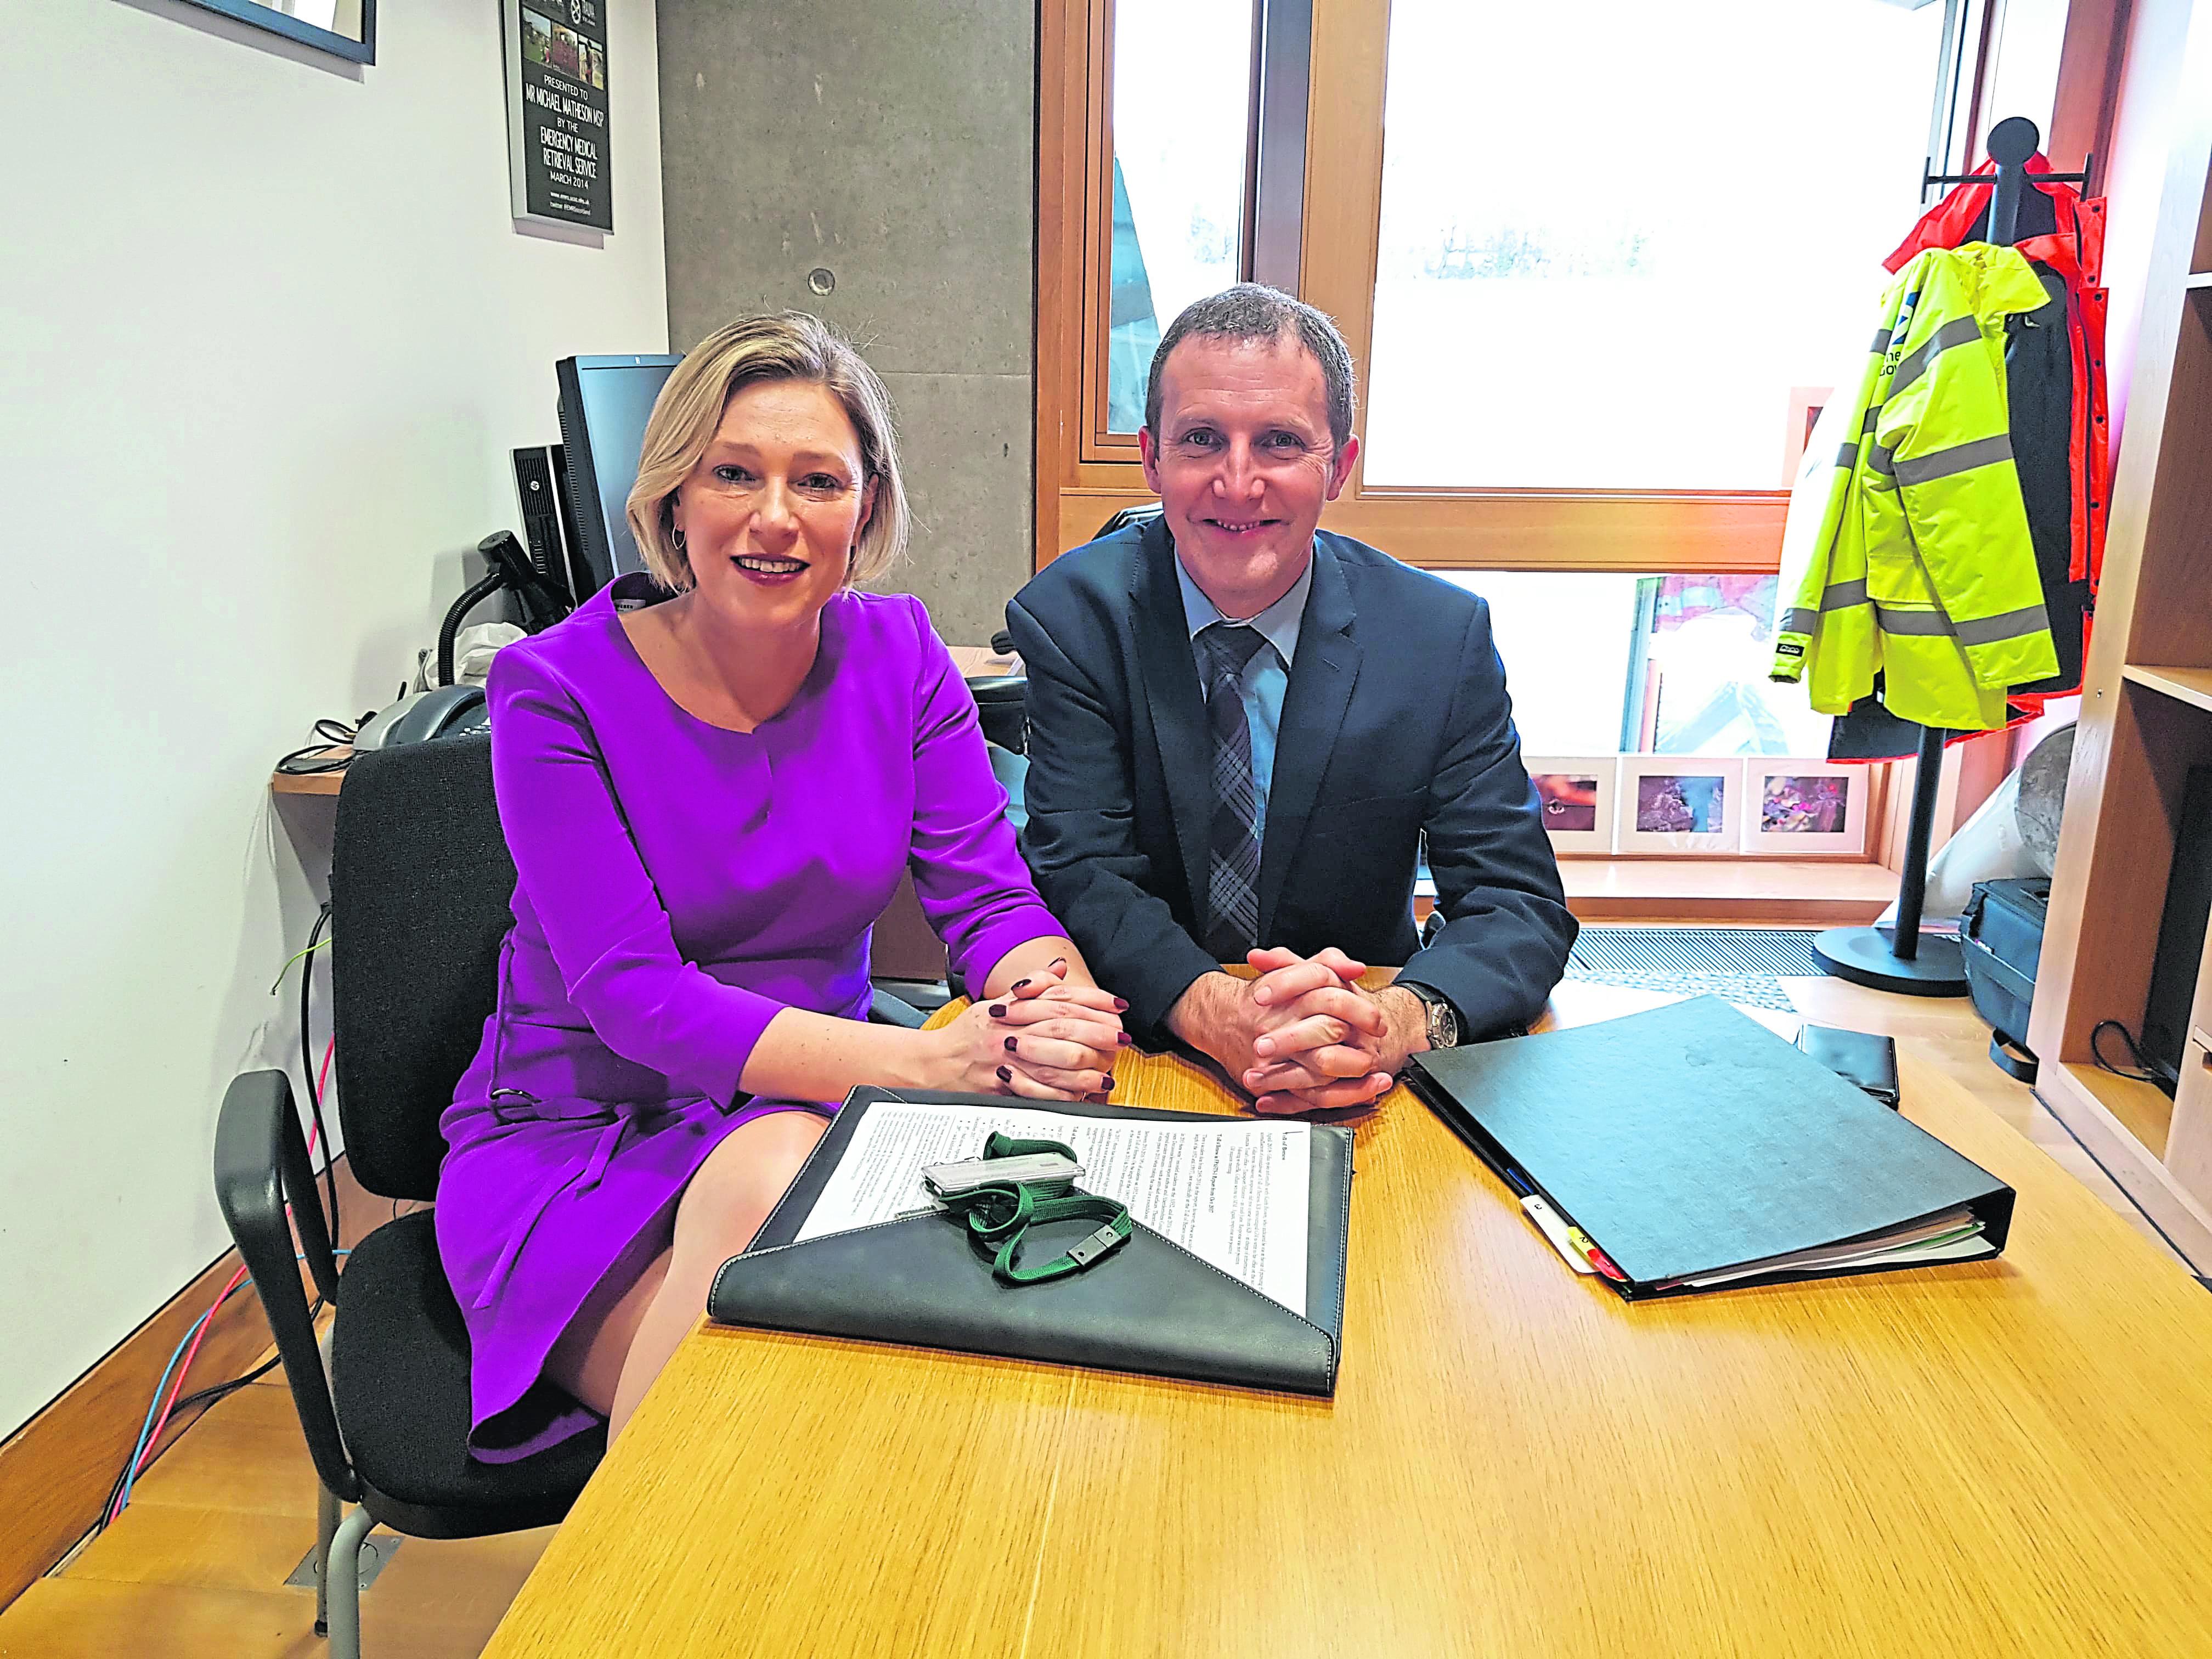 Aberdeenshire MSP Gillian Martin meeting Michael Matheson to discuss the Toll of Birness